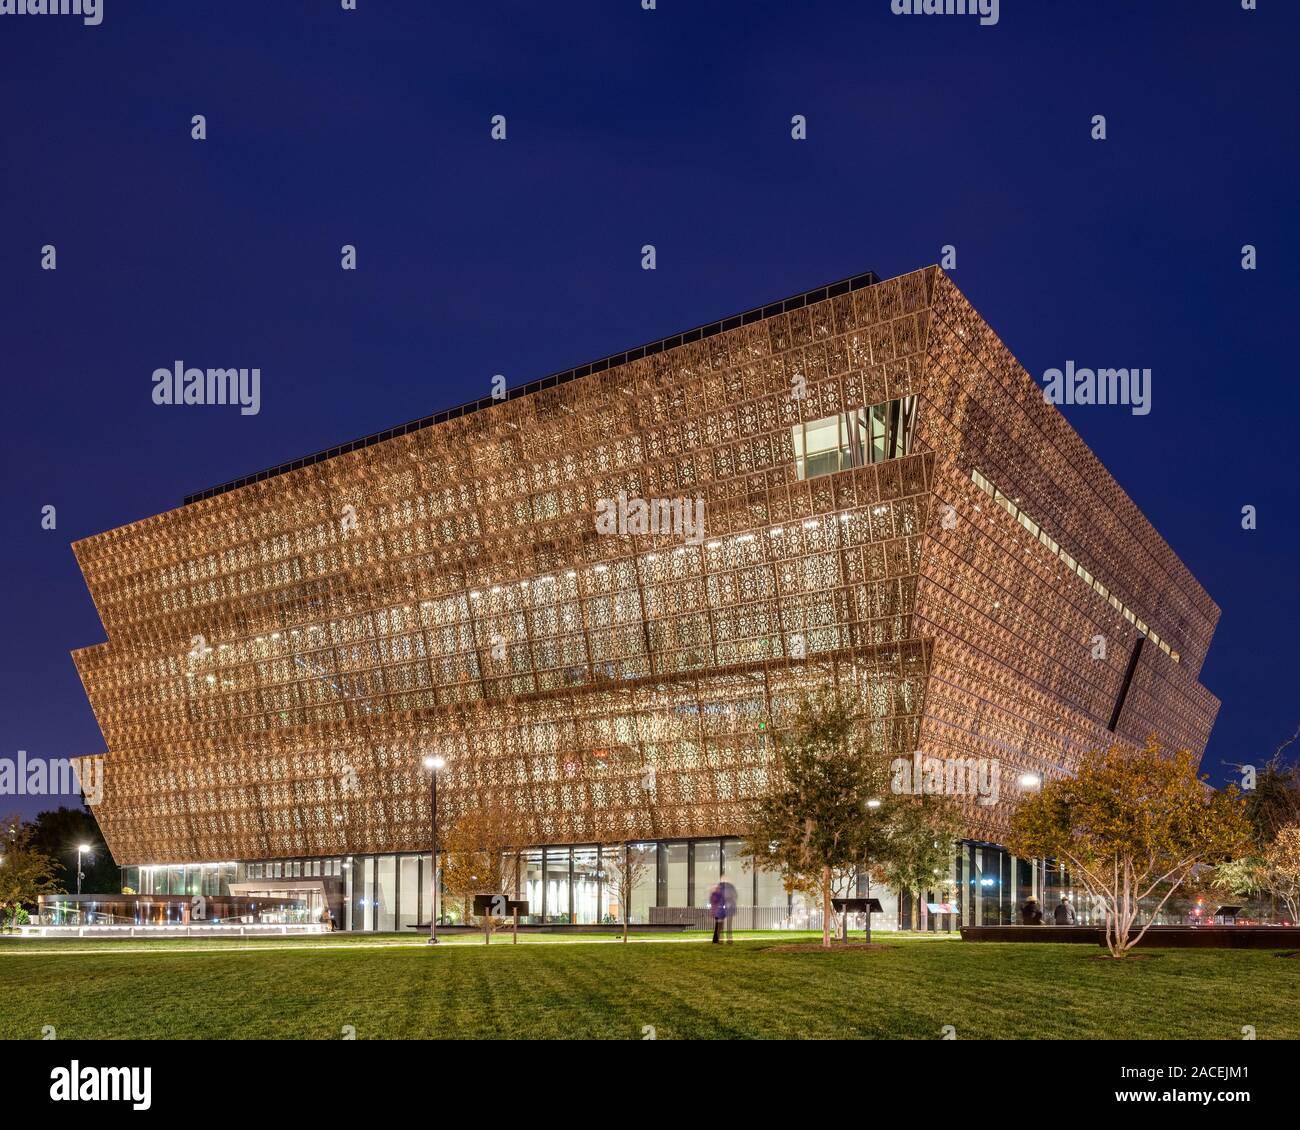 National Museum of African American History and Culture conçu par David Adjaye Banque D'Images